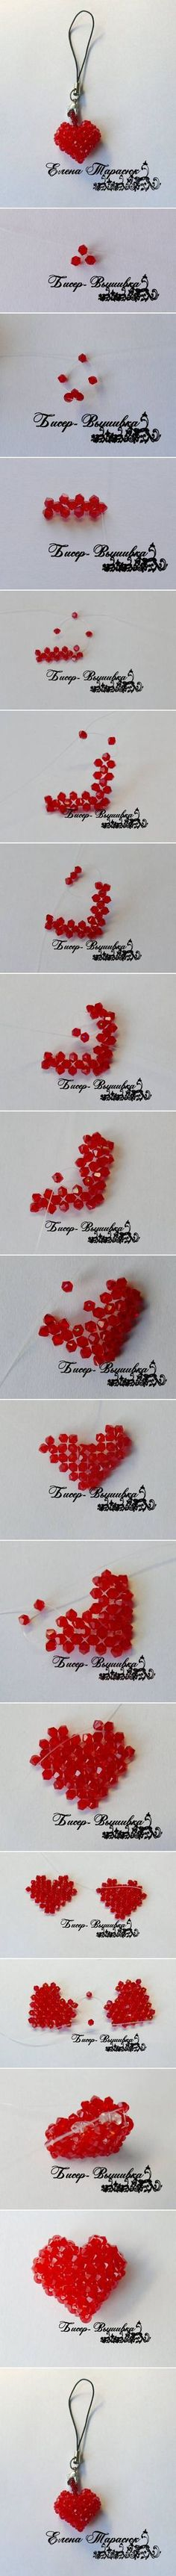 DIY Beads Heart Ornament